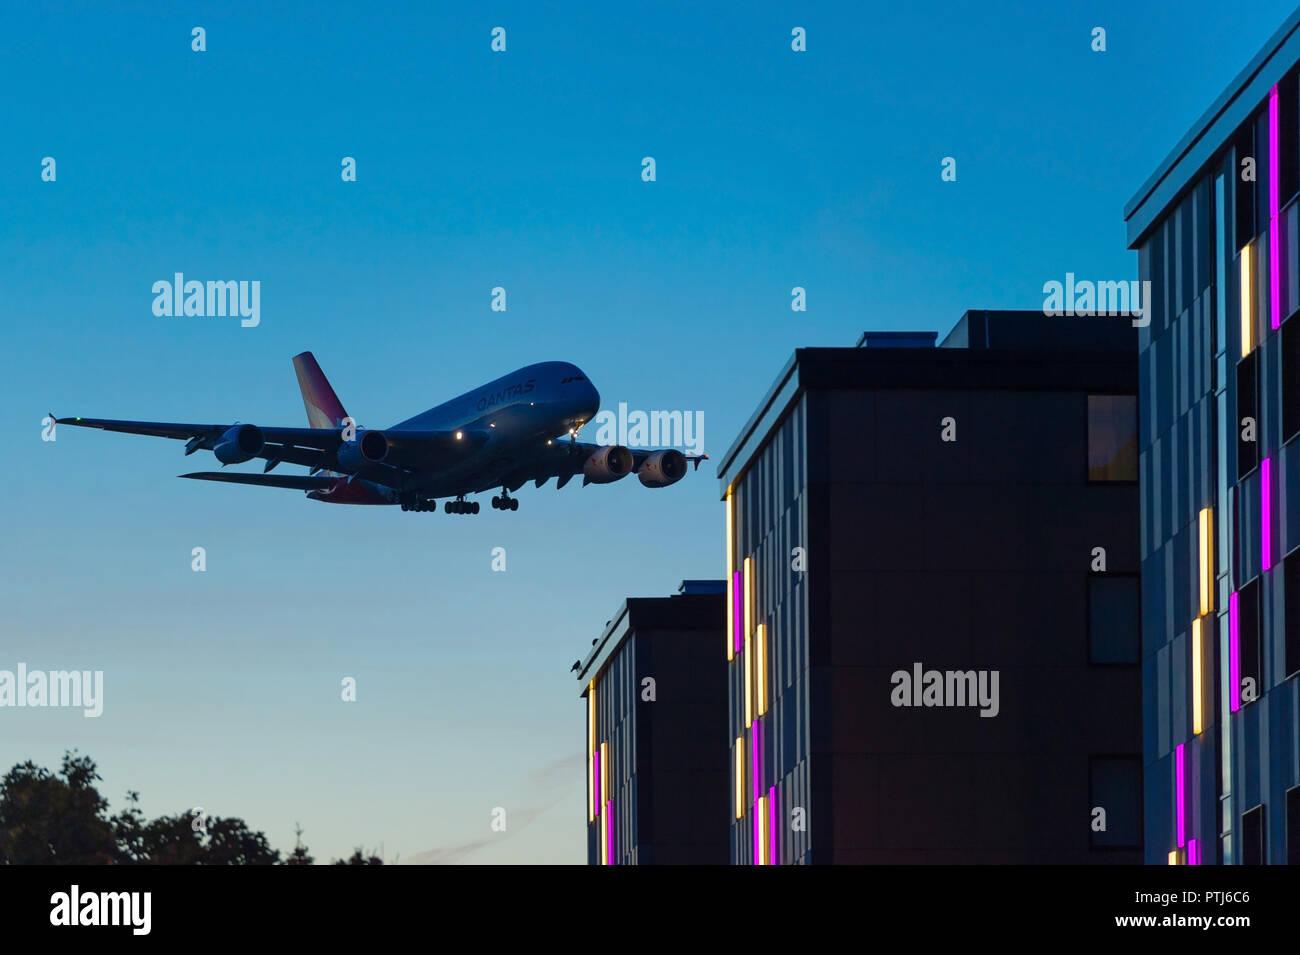 Airbus A380 Sbarco Immagini Stock